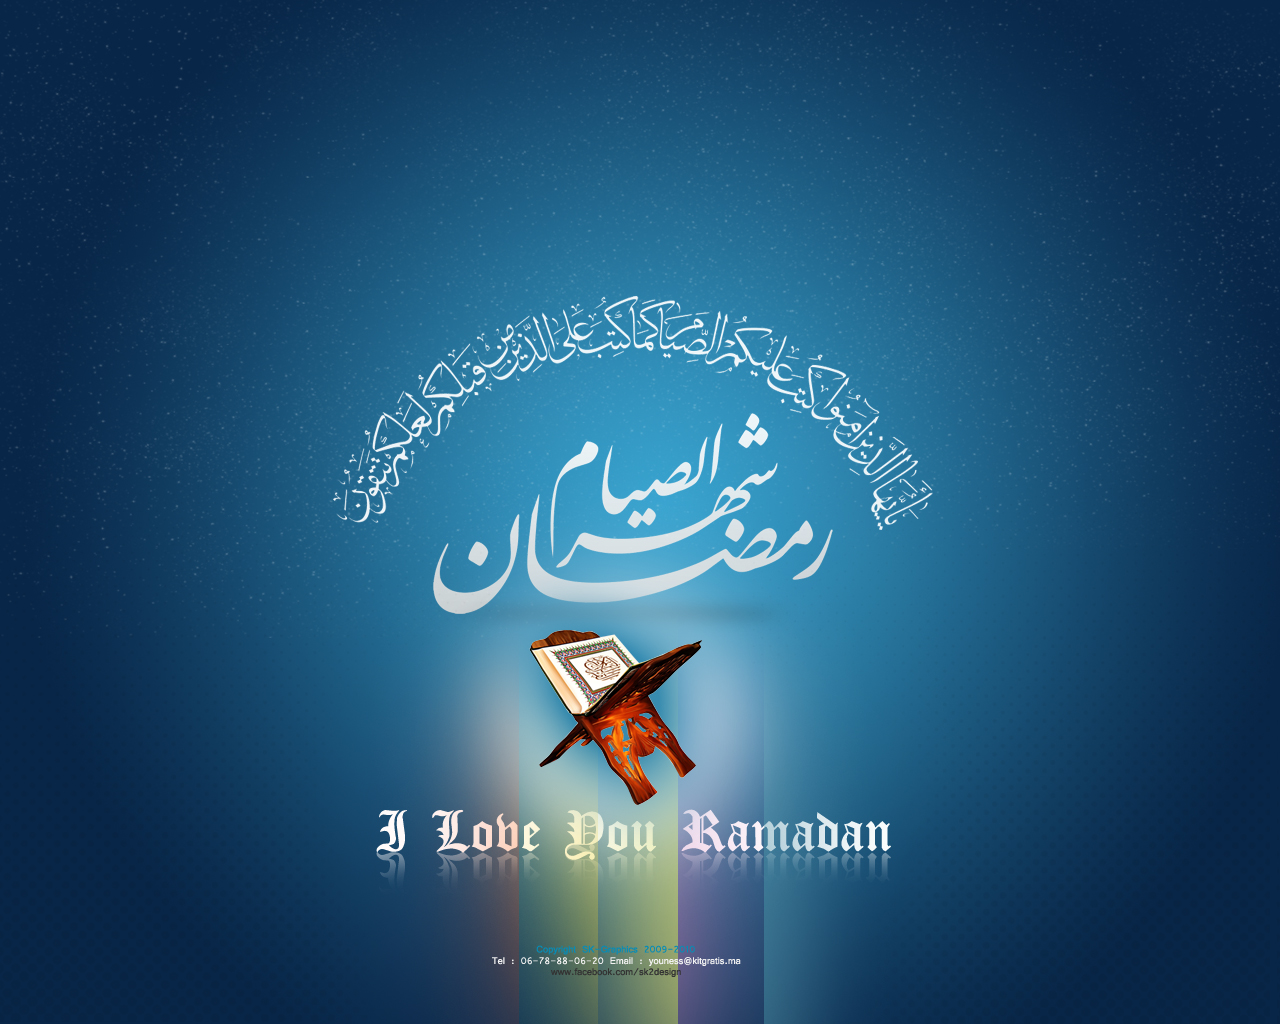 Wallpaper Ramadan Karem